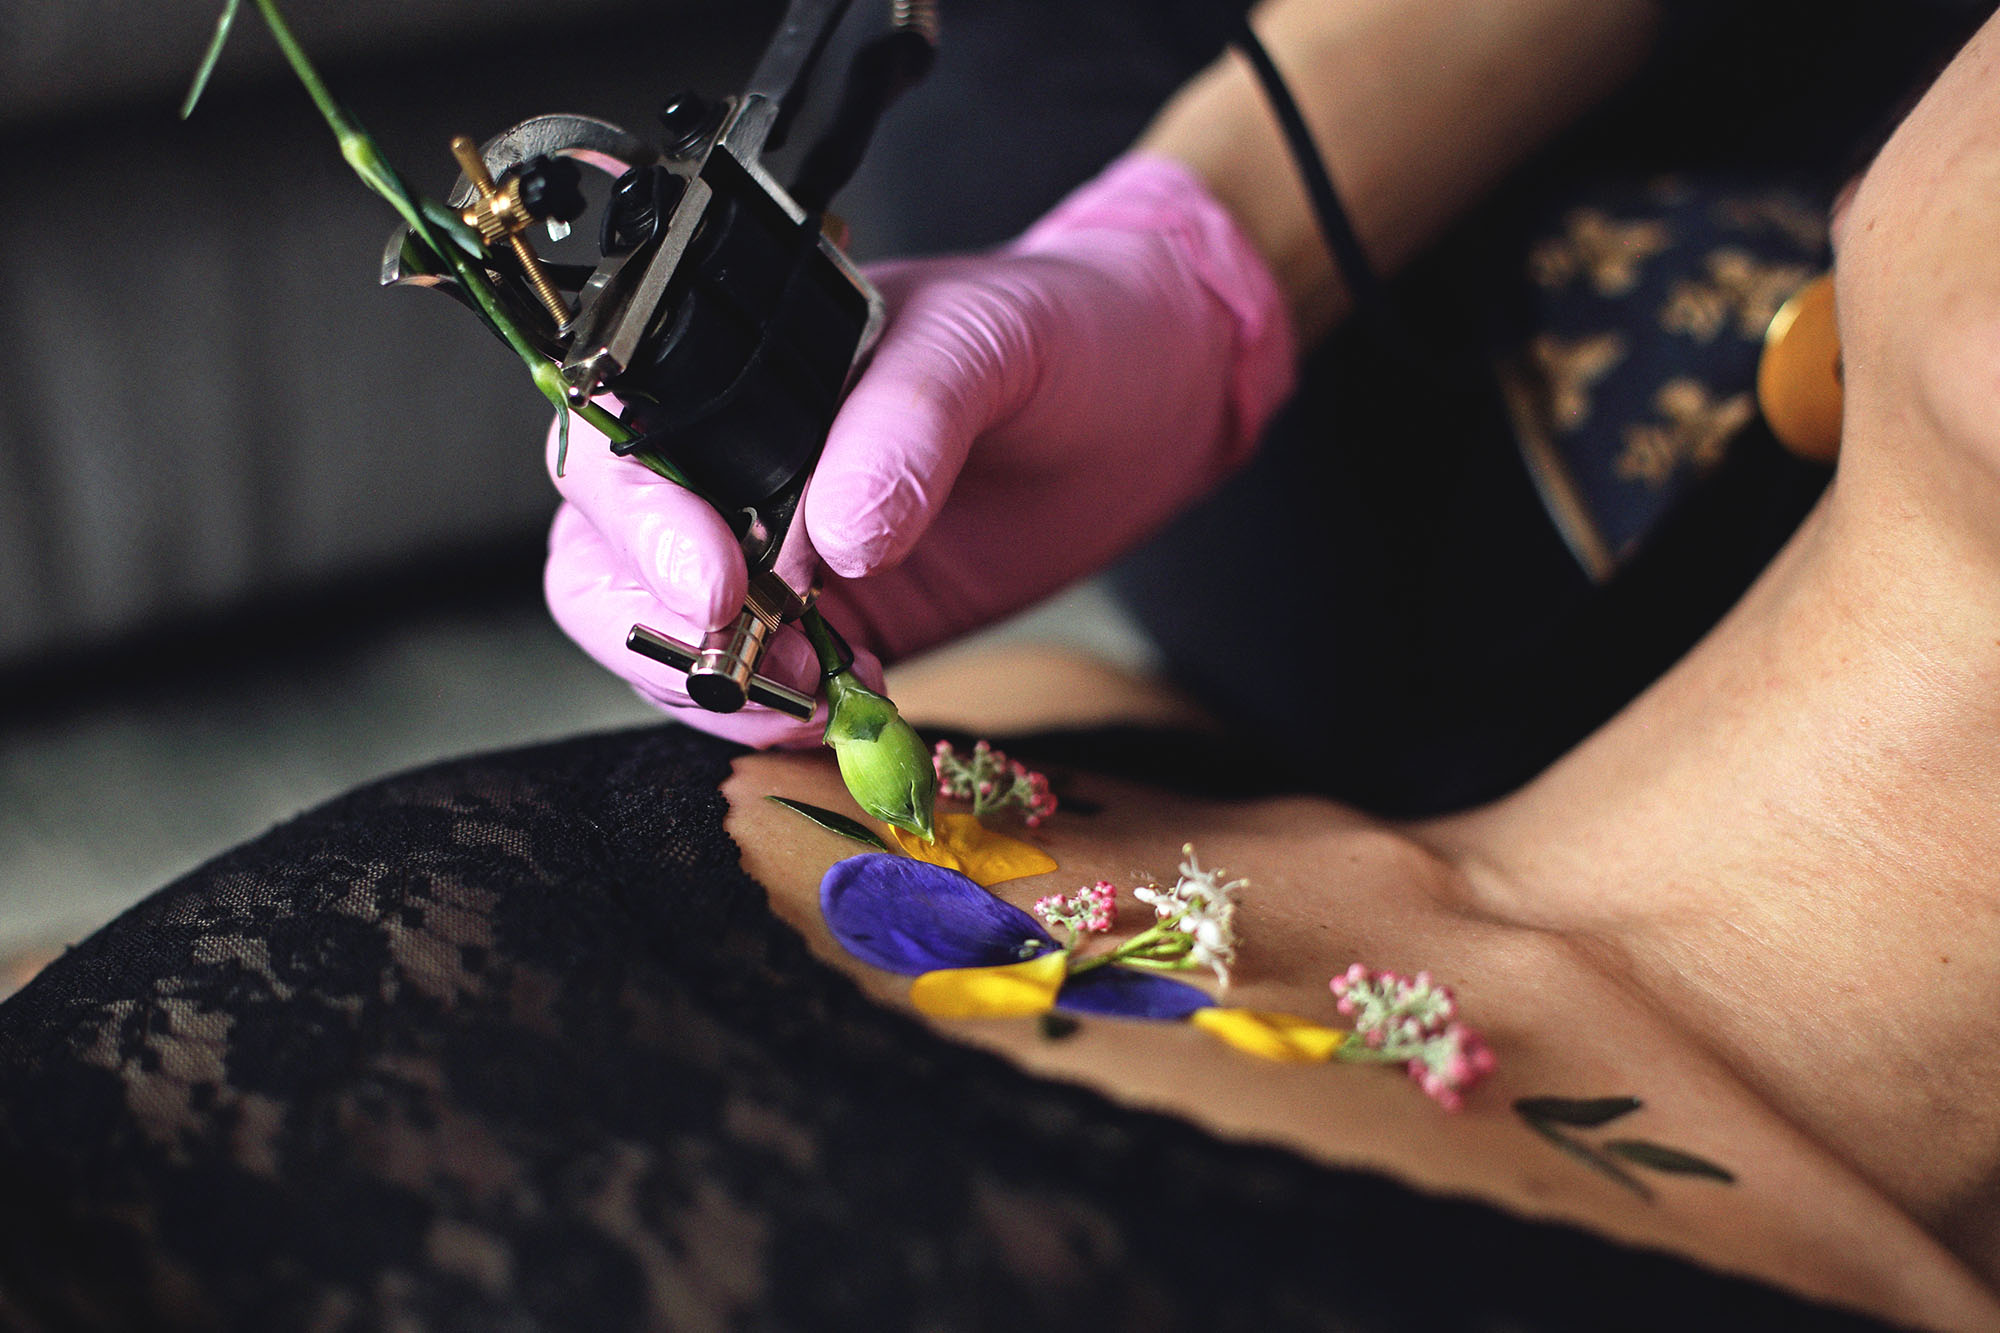 Lady-biche-tatouage-photo-GM-5